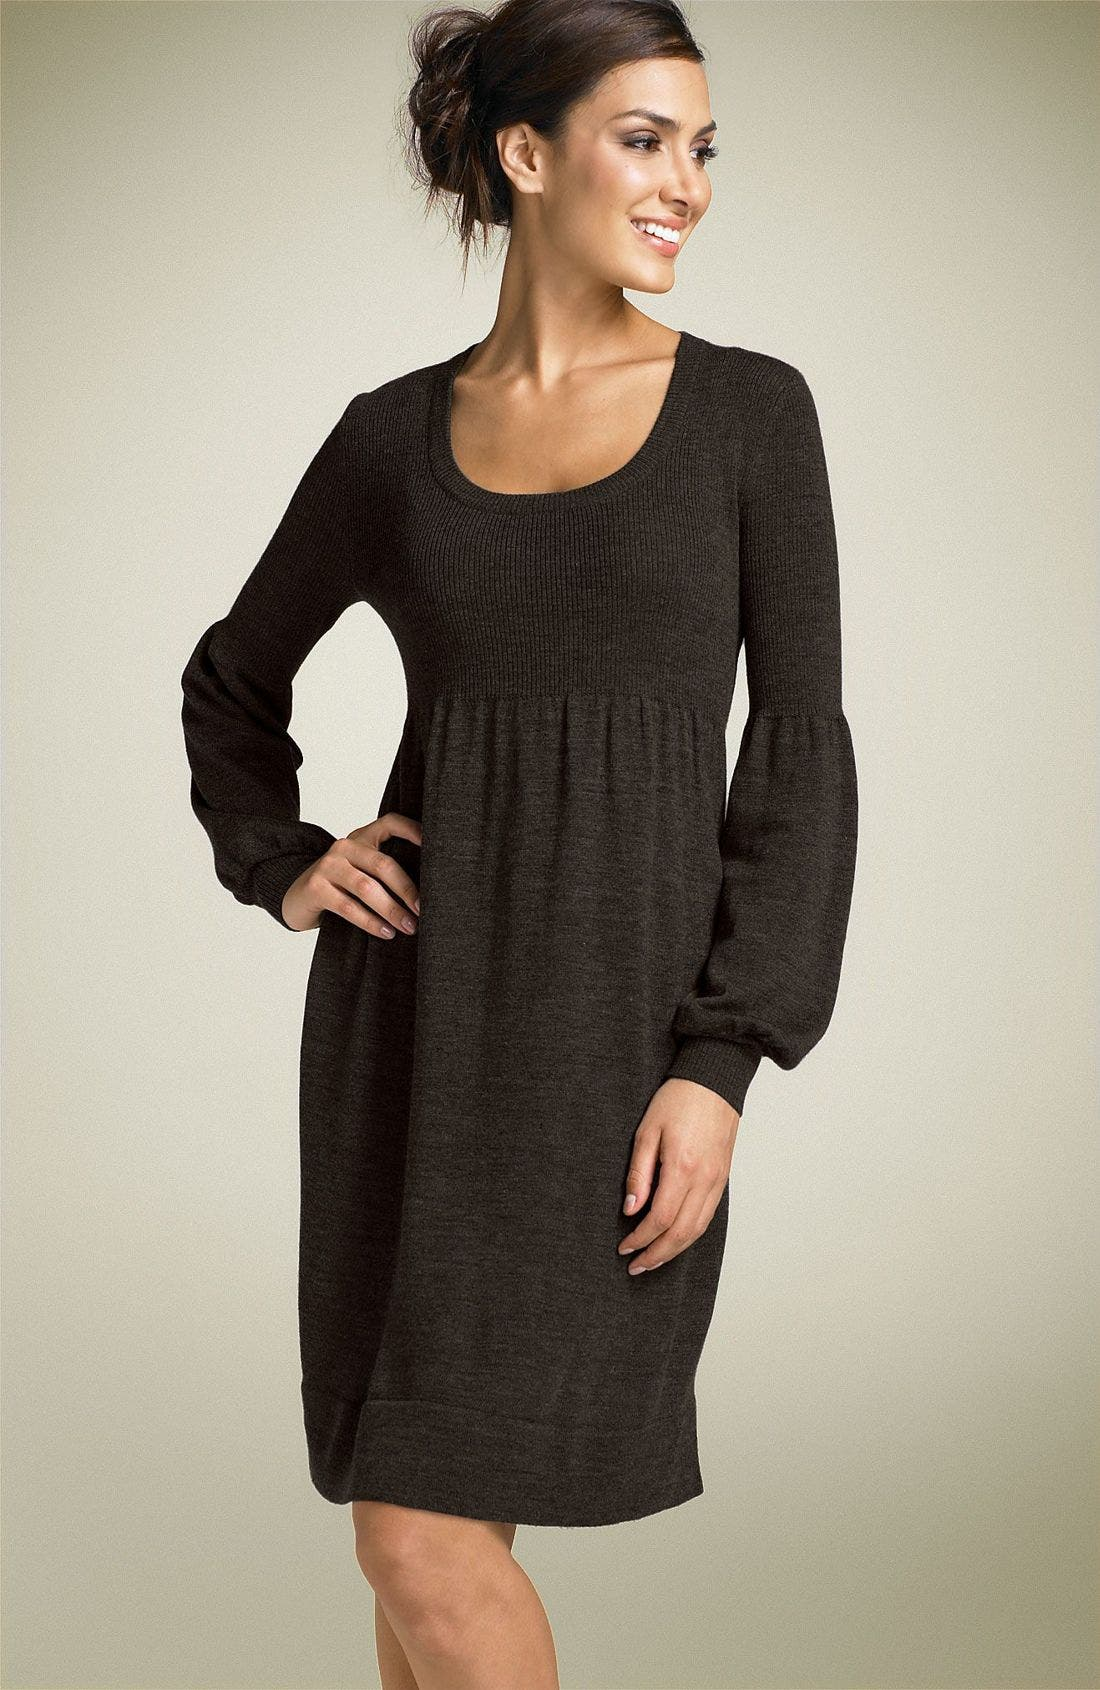 Alternate Image 1 Selected - Calvin Klein Scoop Neck Sweater Dress